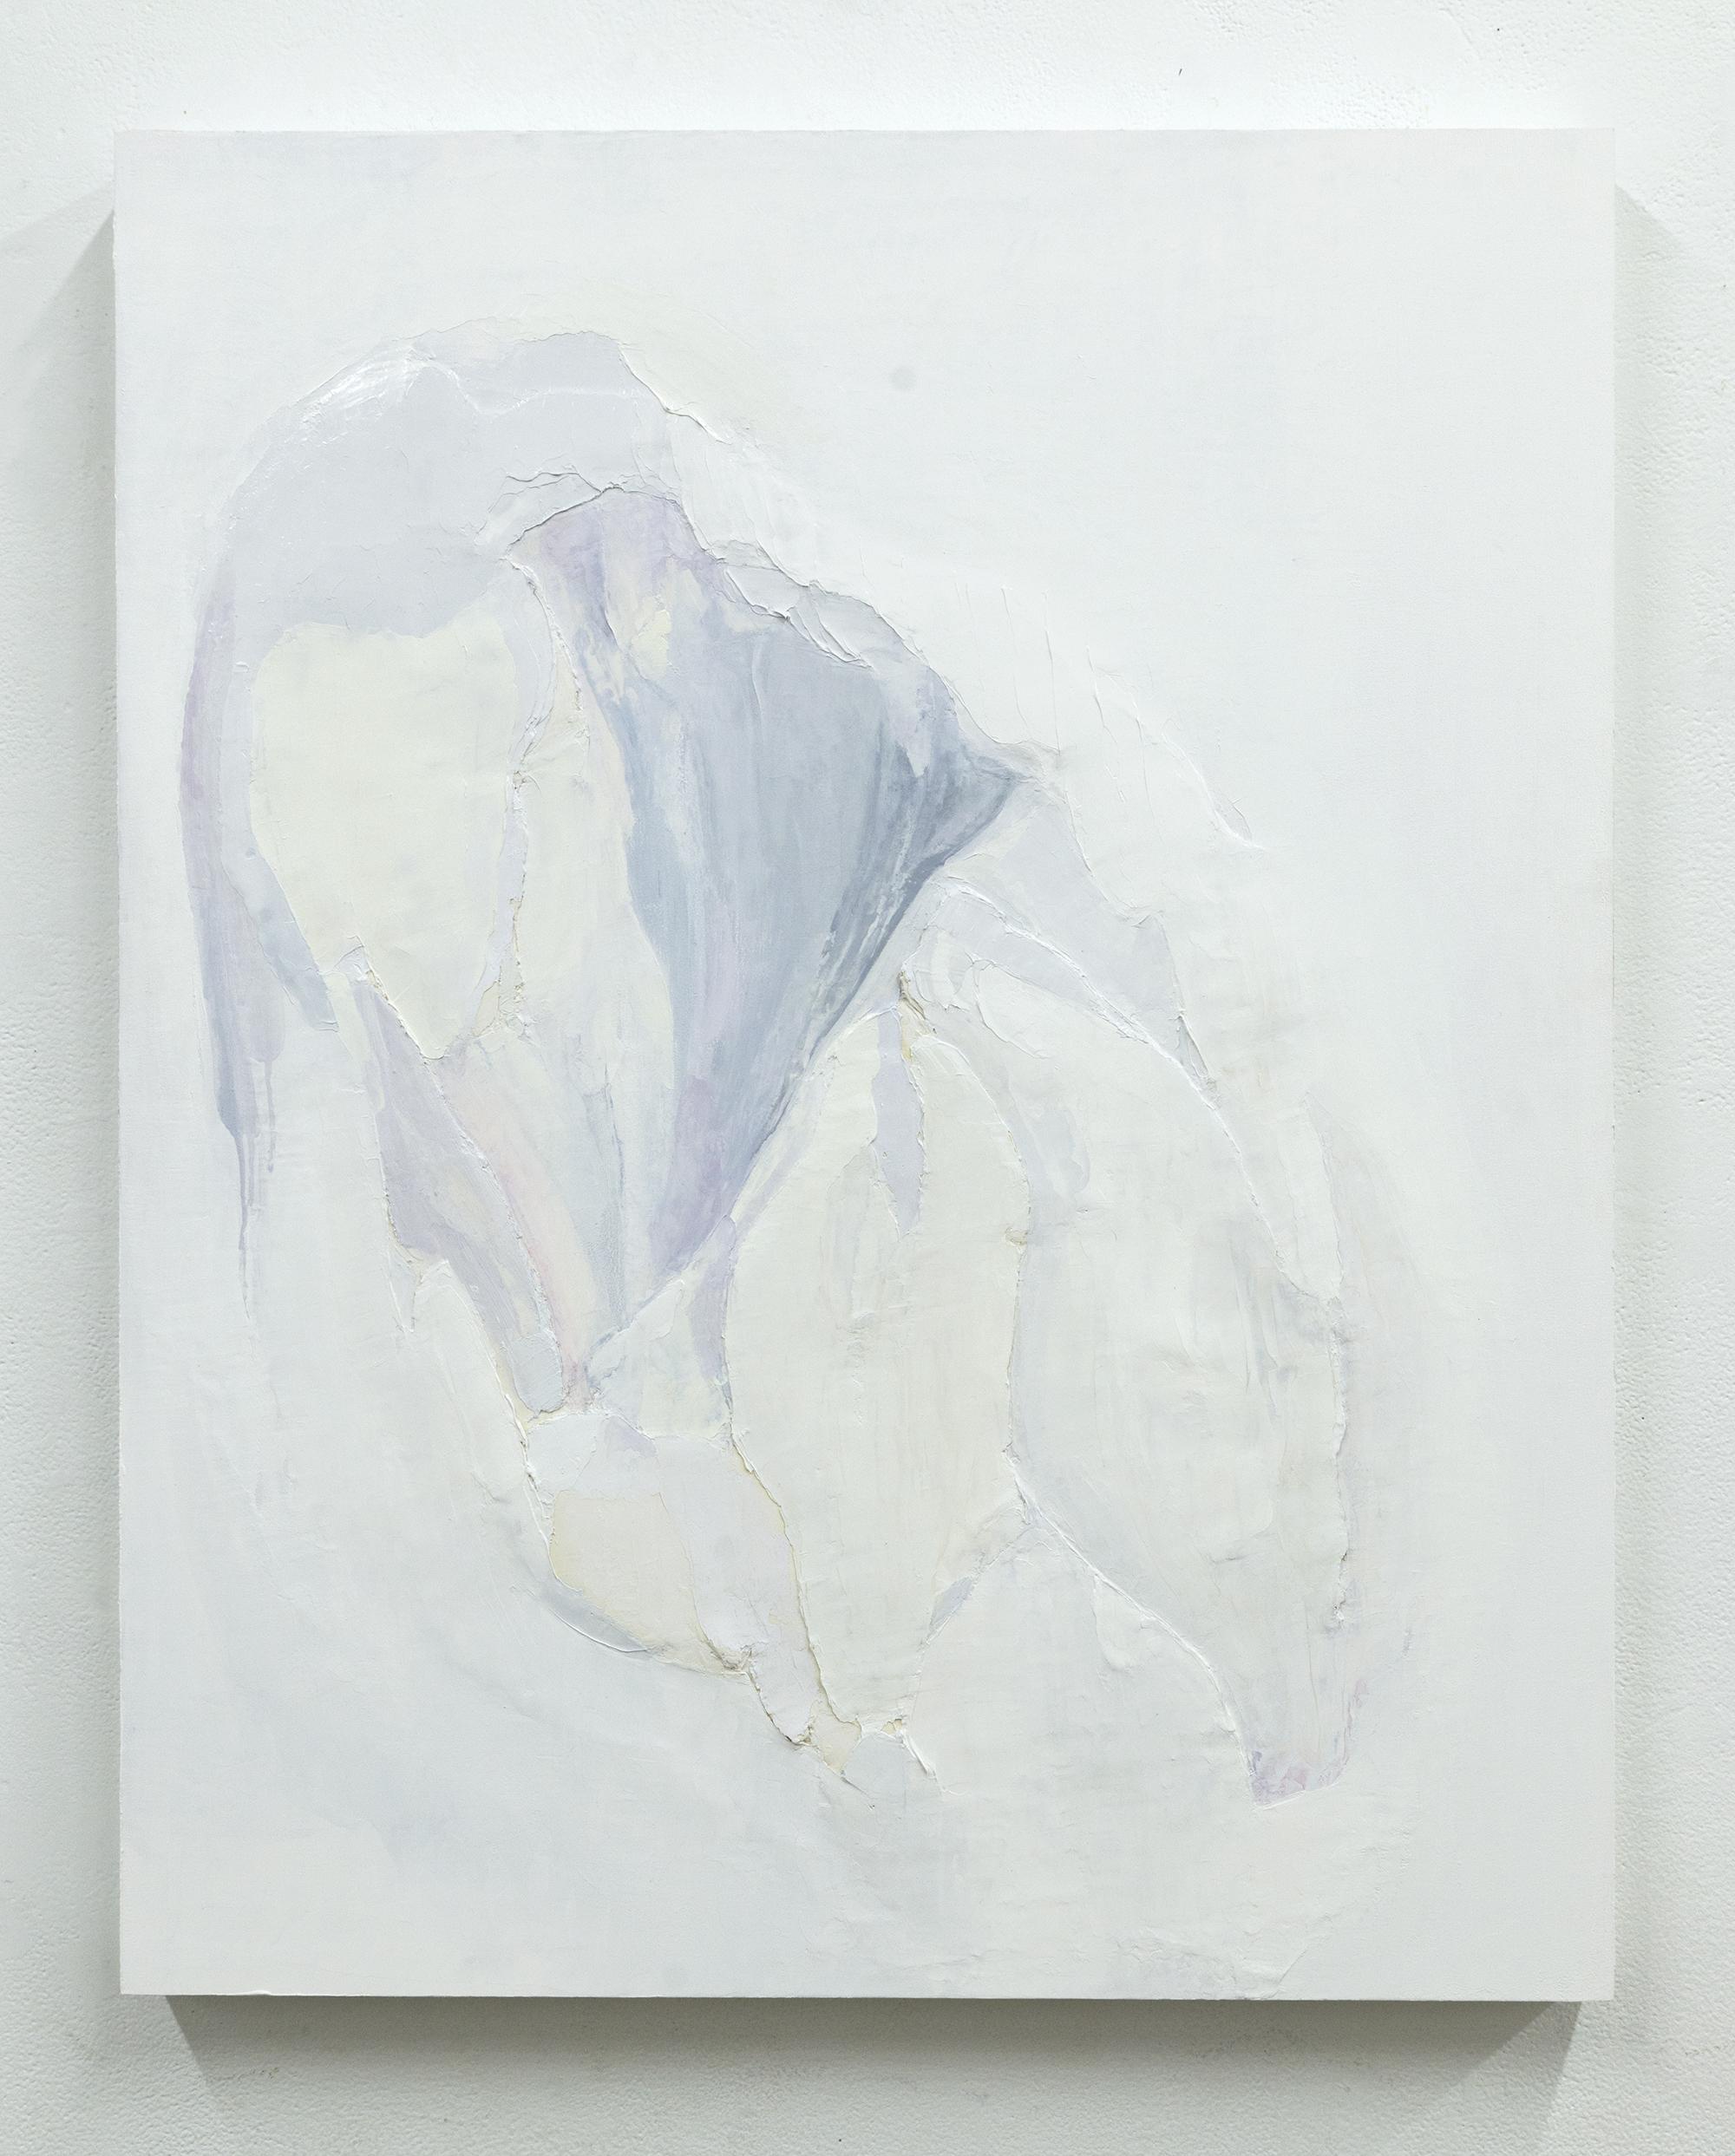 Untitled (Cavity I), 2017